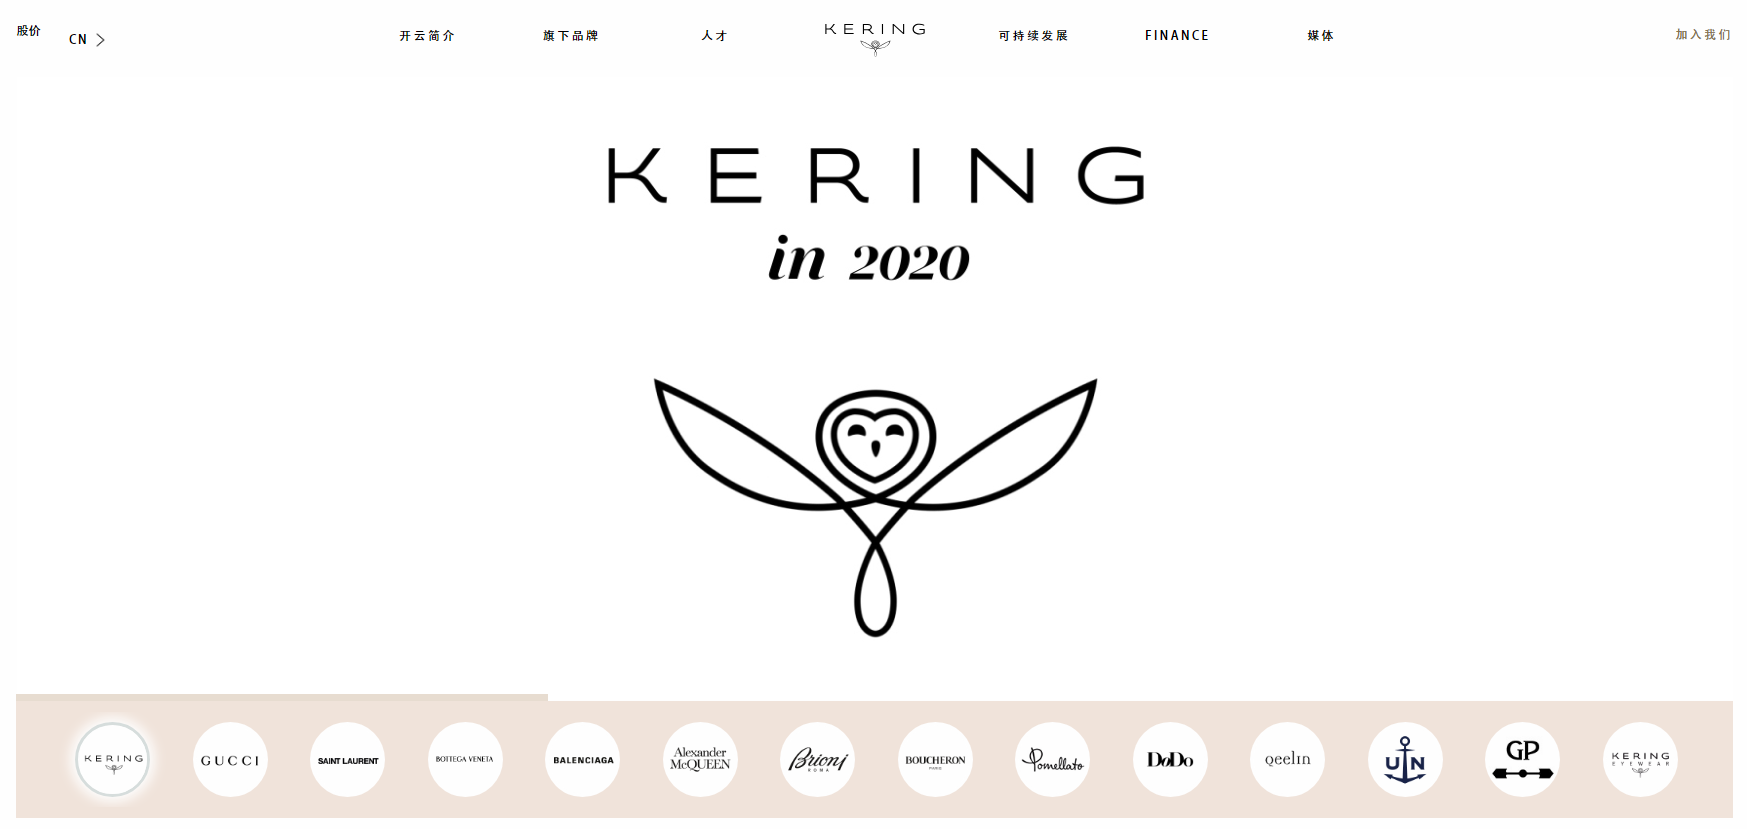 Mediobanca最新报告称:2020年前三季全球时尚企业销售收入下滑21.8%